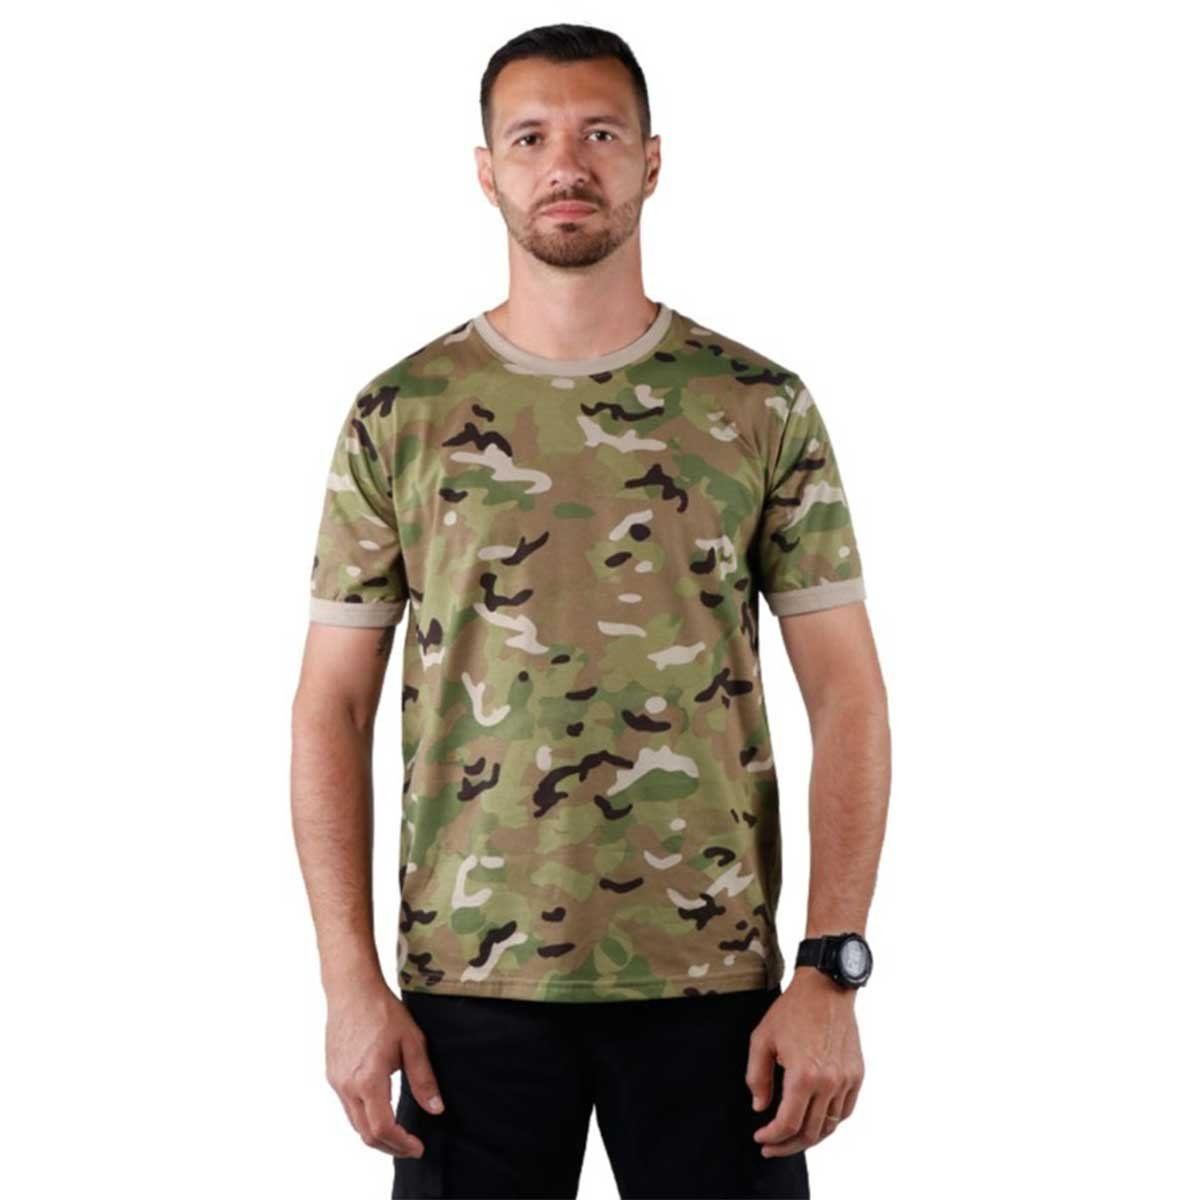 Camiseta Masculina Bélica Soldier Multicam